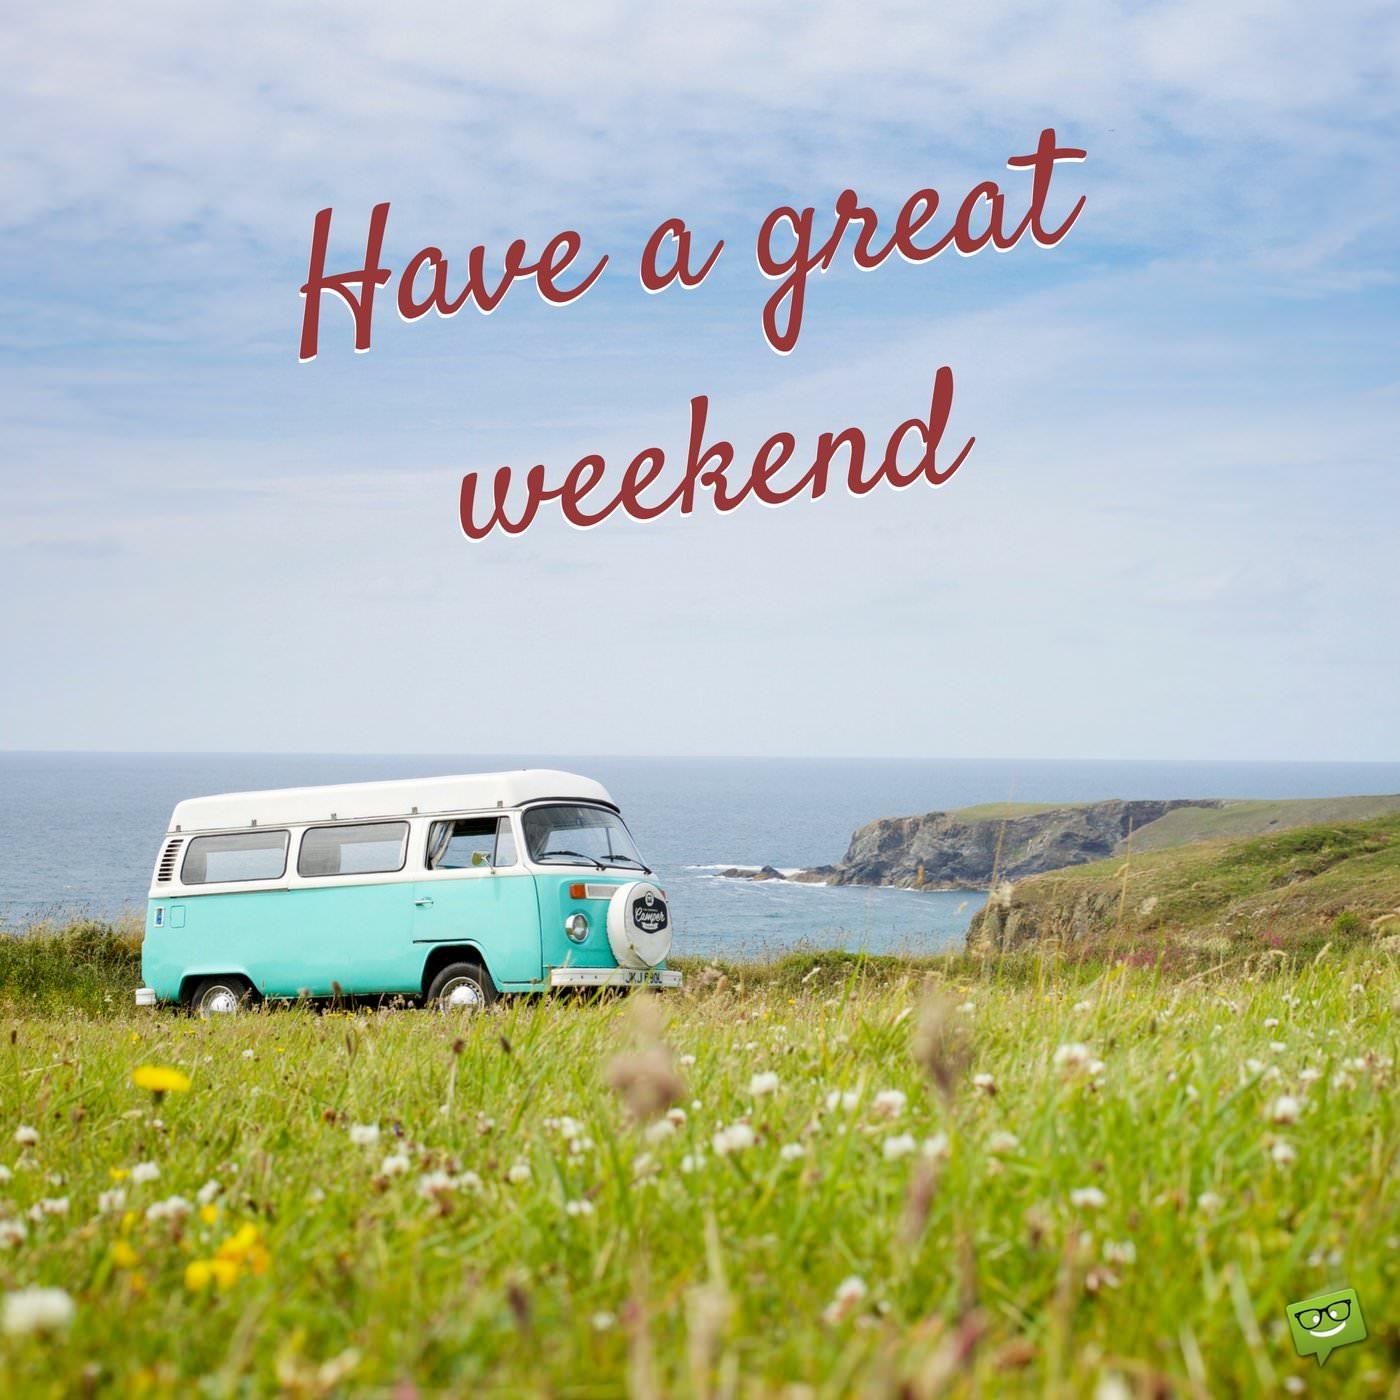 Have-a-great-weekend.-On-image-of-a-vintage-camping-van-by-the-ocean.jpg